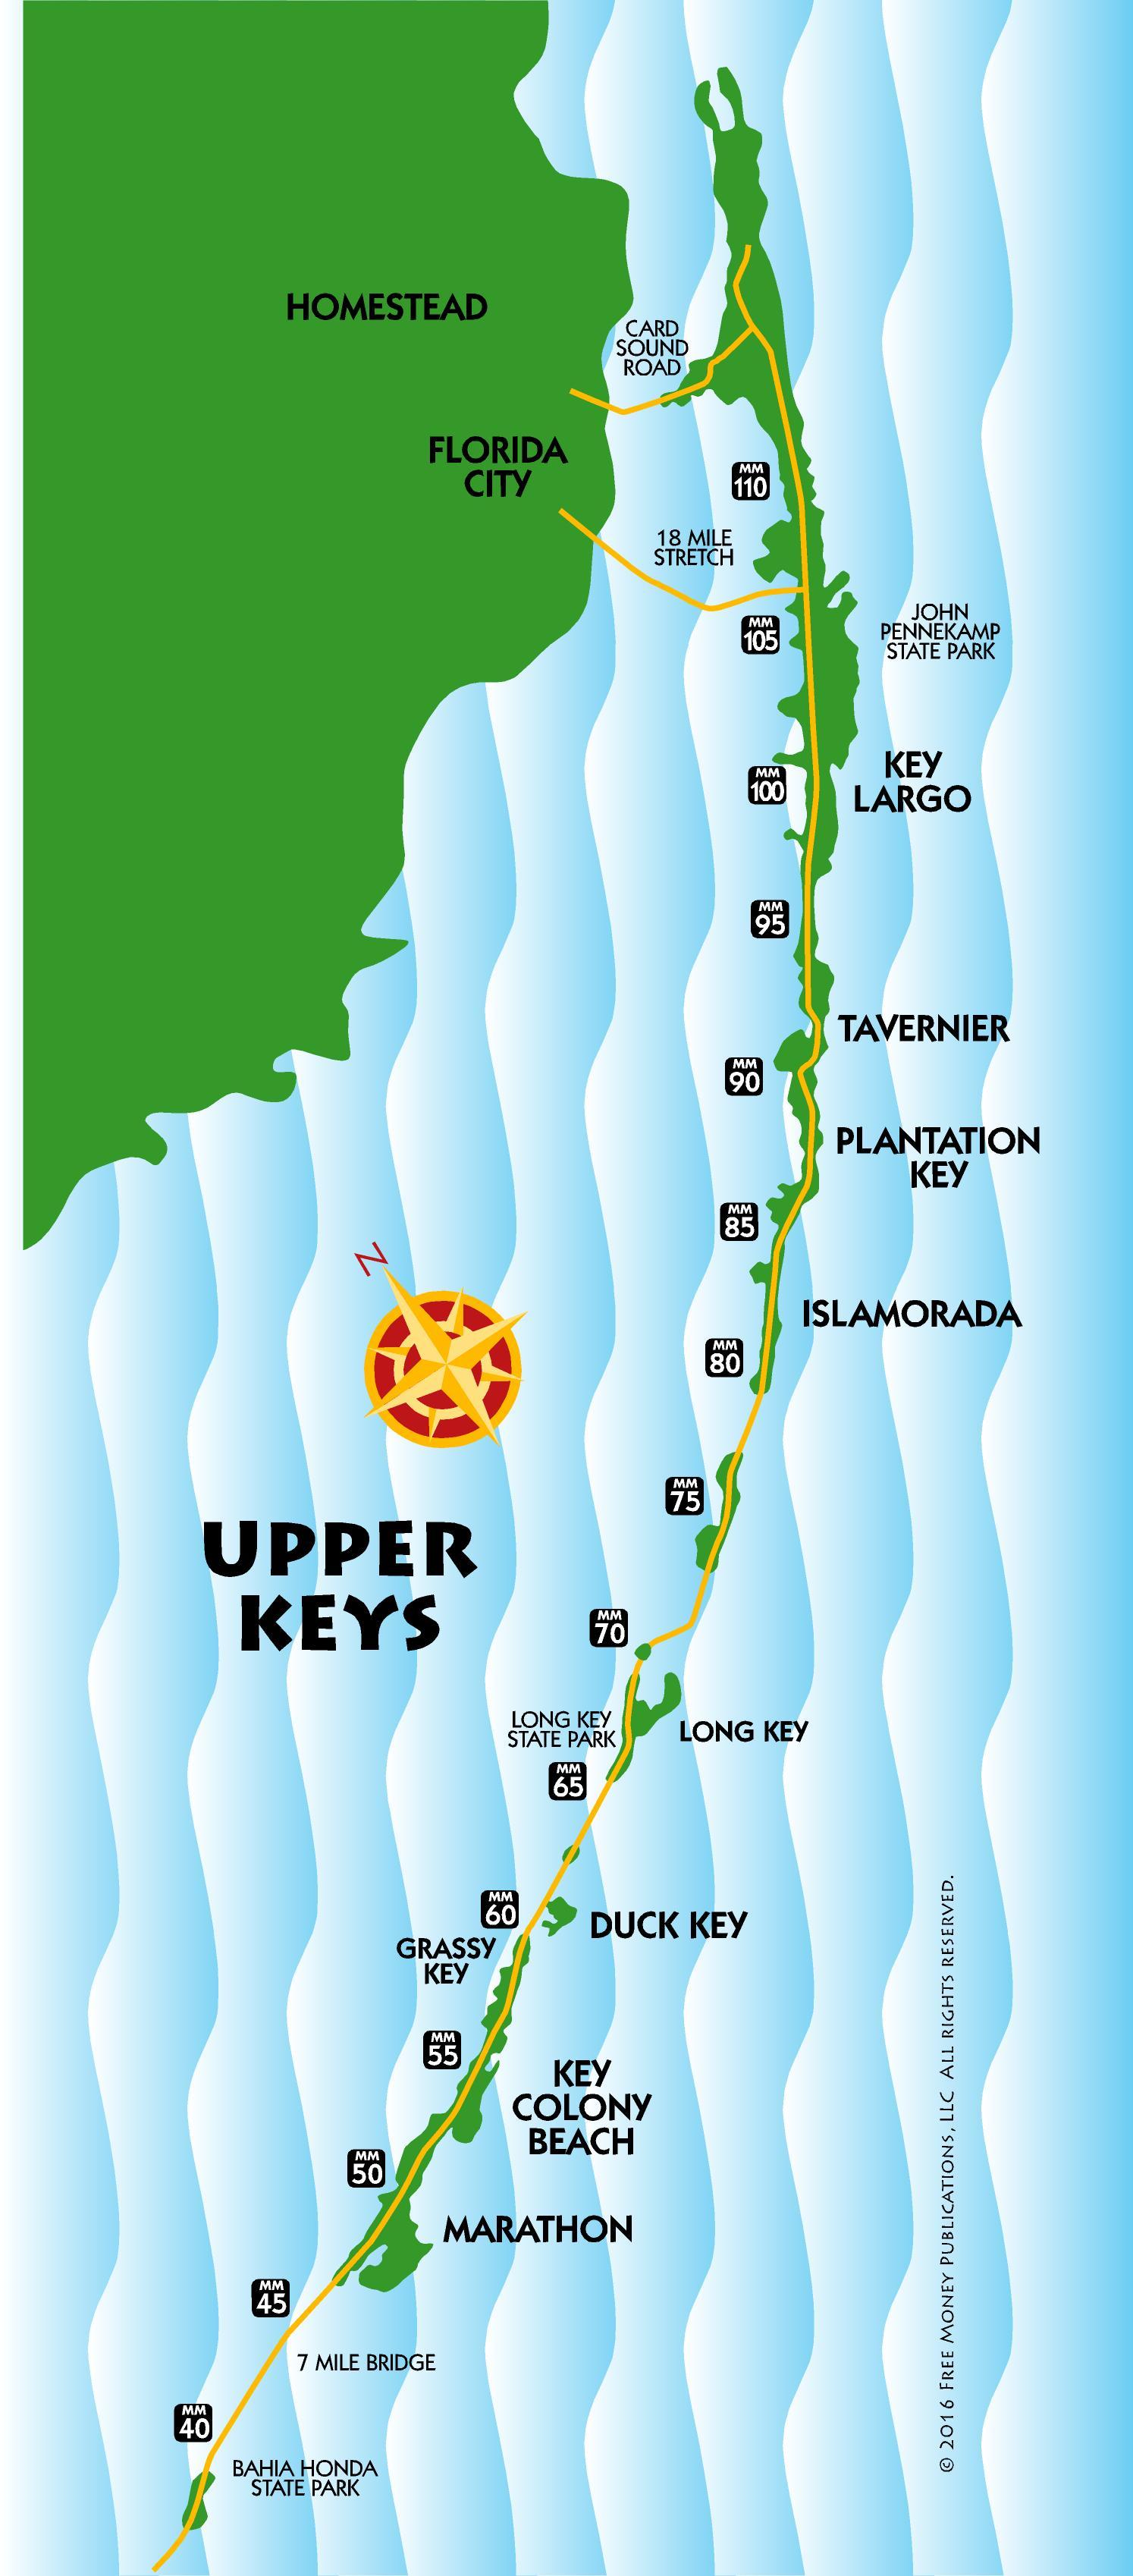 LC Rd Grade Thinkers Maps US And Canada Printable Blank Maps Key - Florida keys map pdf